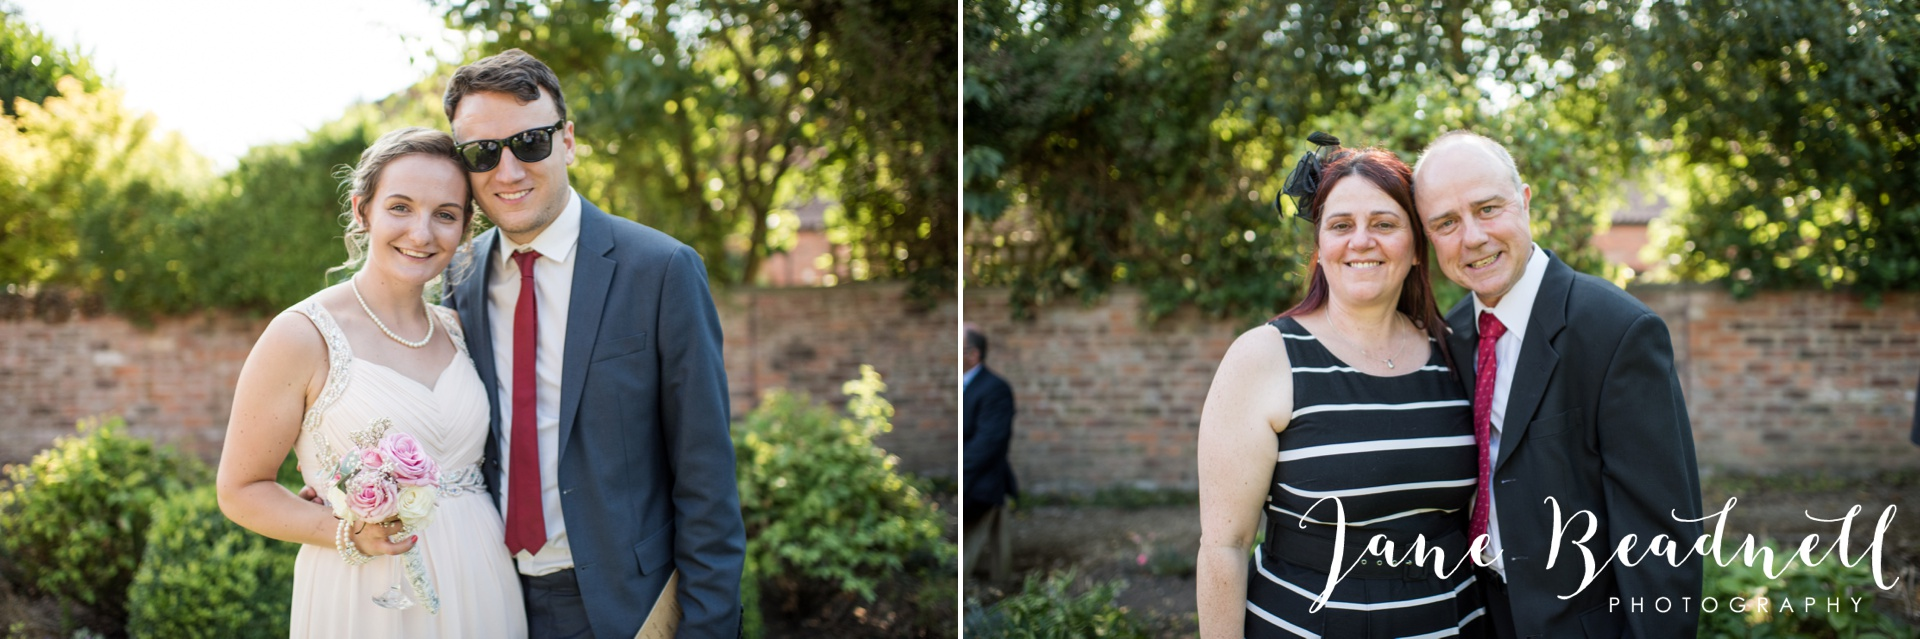 yorkshire-fine-art-wedding-photographer-jane-beadnell-photography-poppleton-york_0082